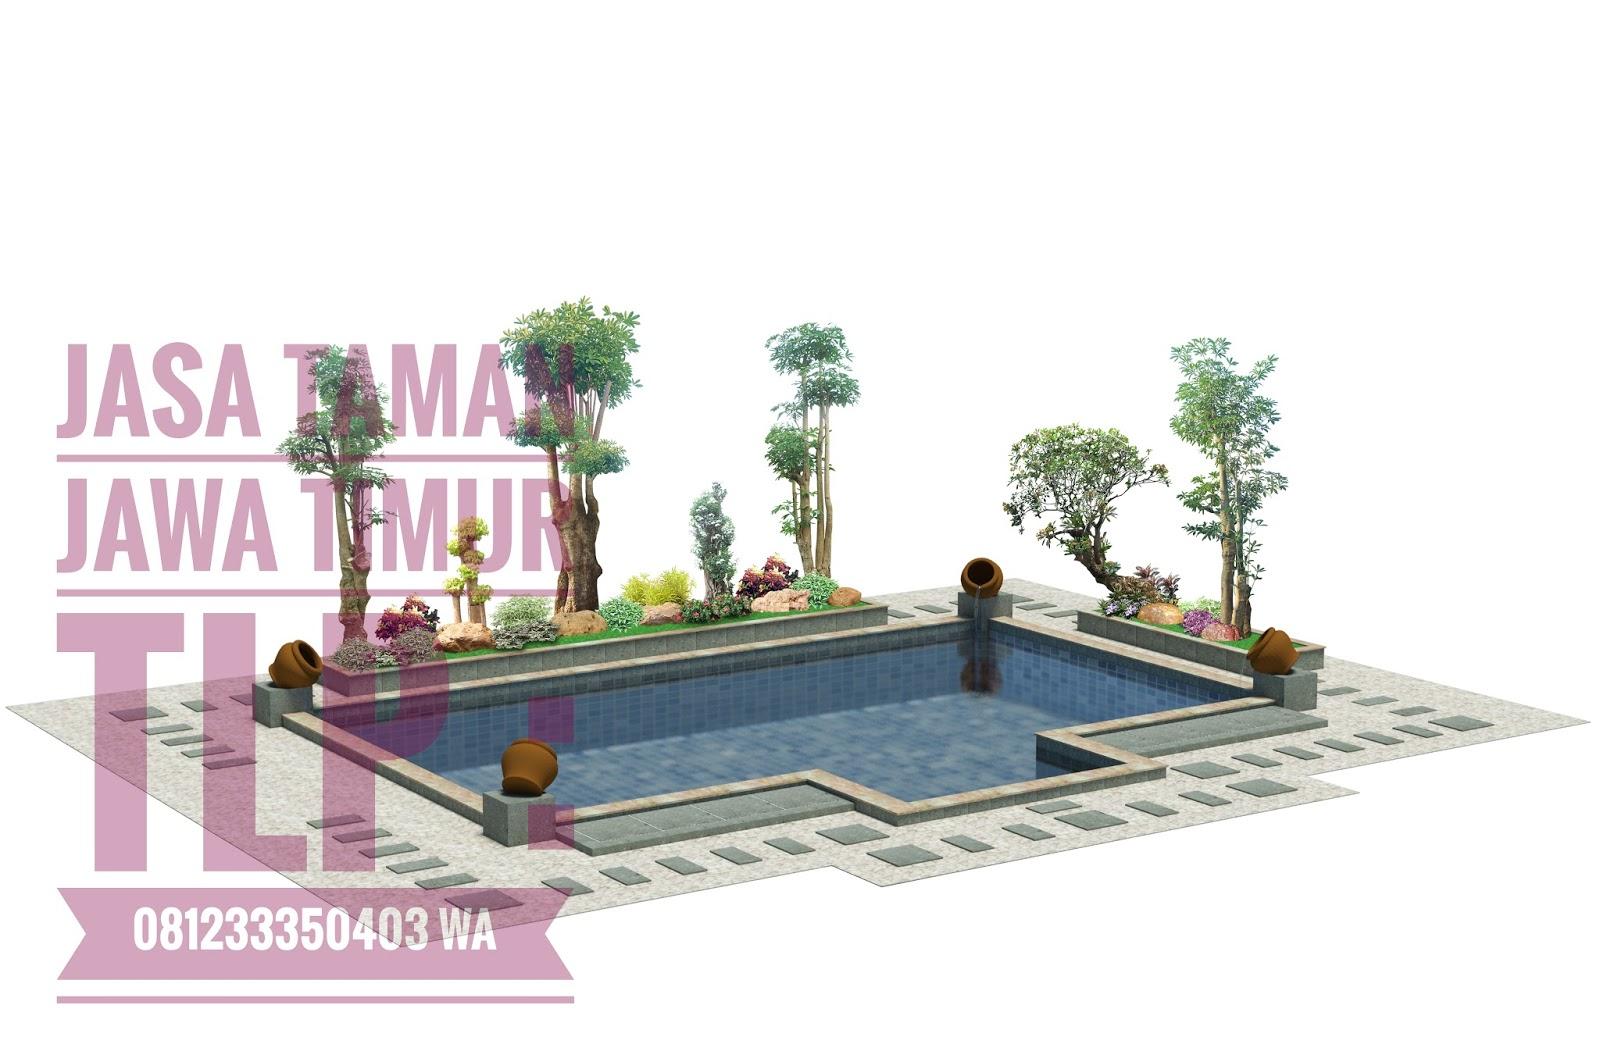 Jasa Desain Taman Kolam Terbaik Di Surabaya Jasa Taman Jawa Timur